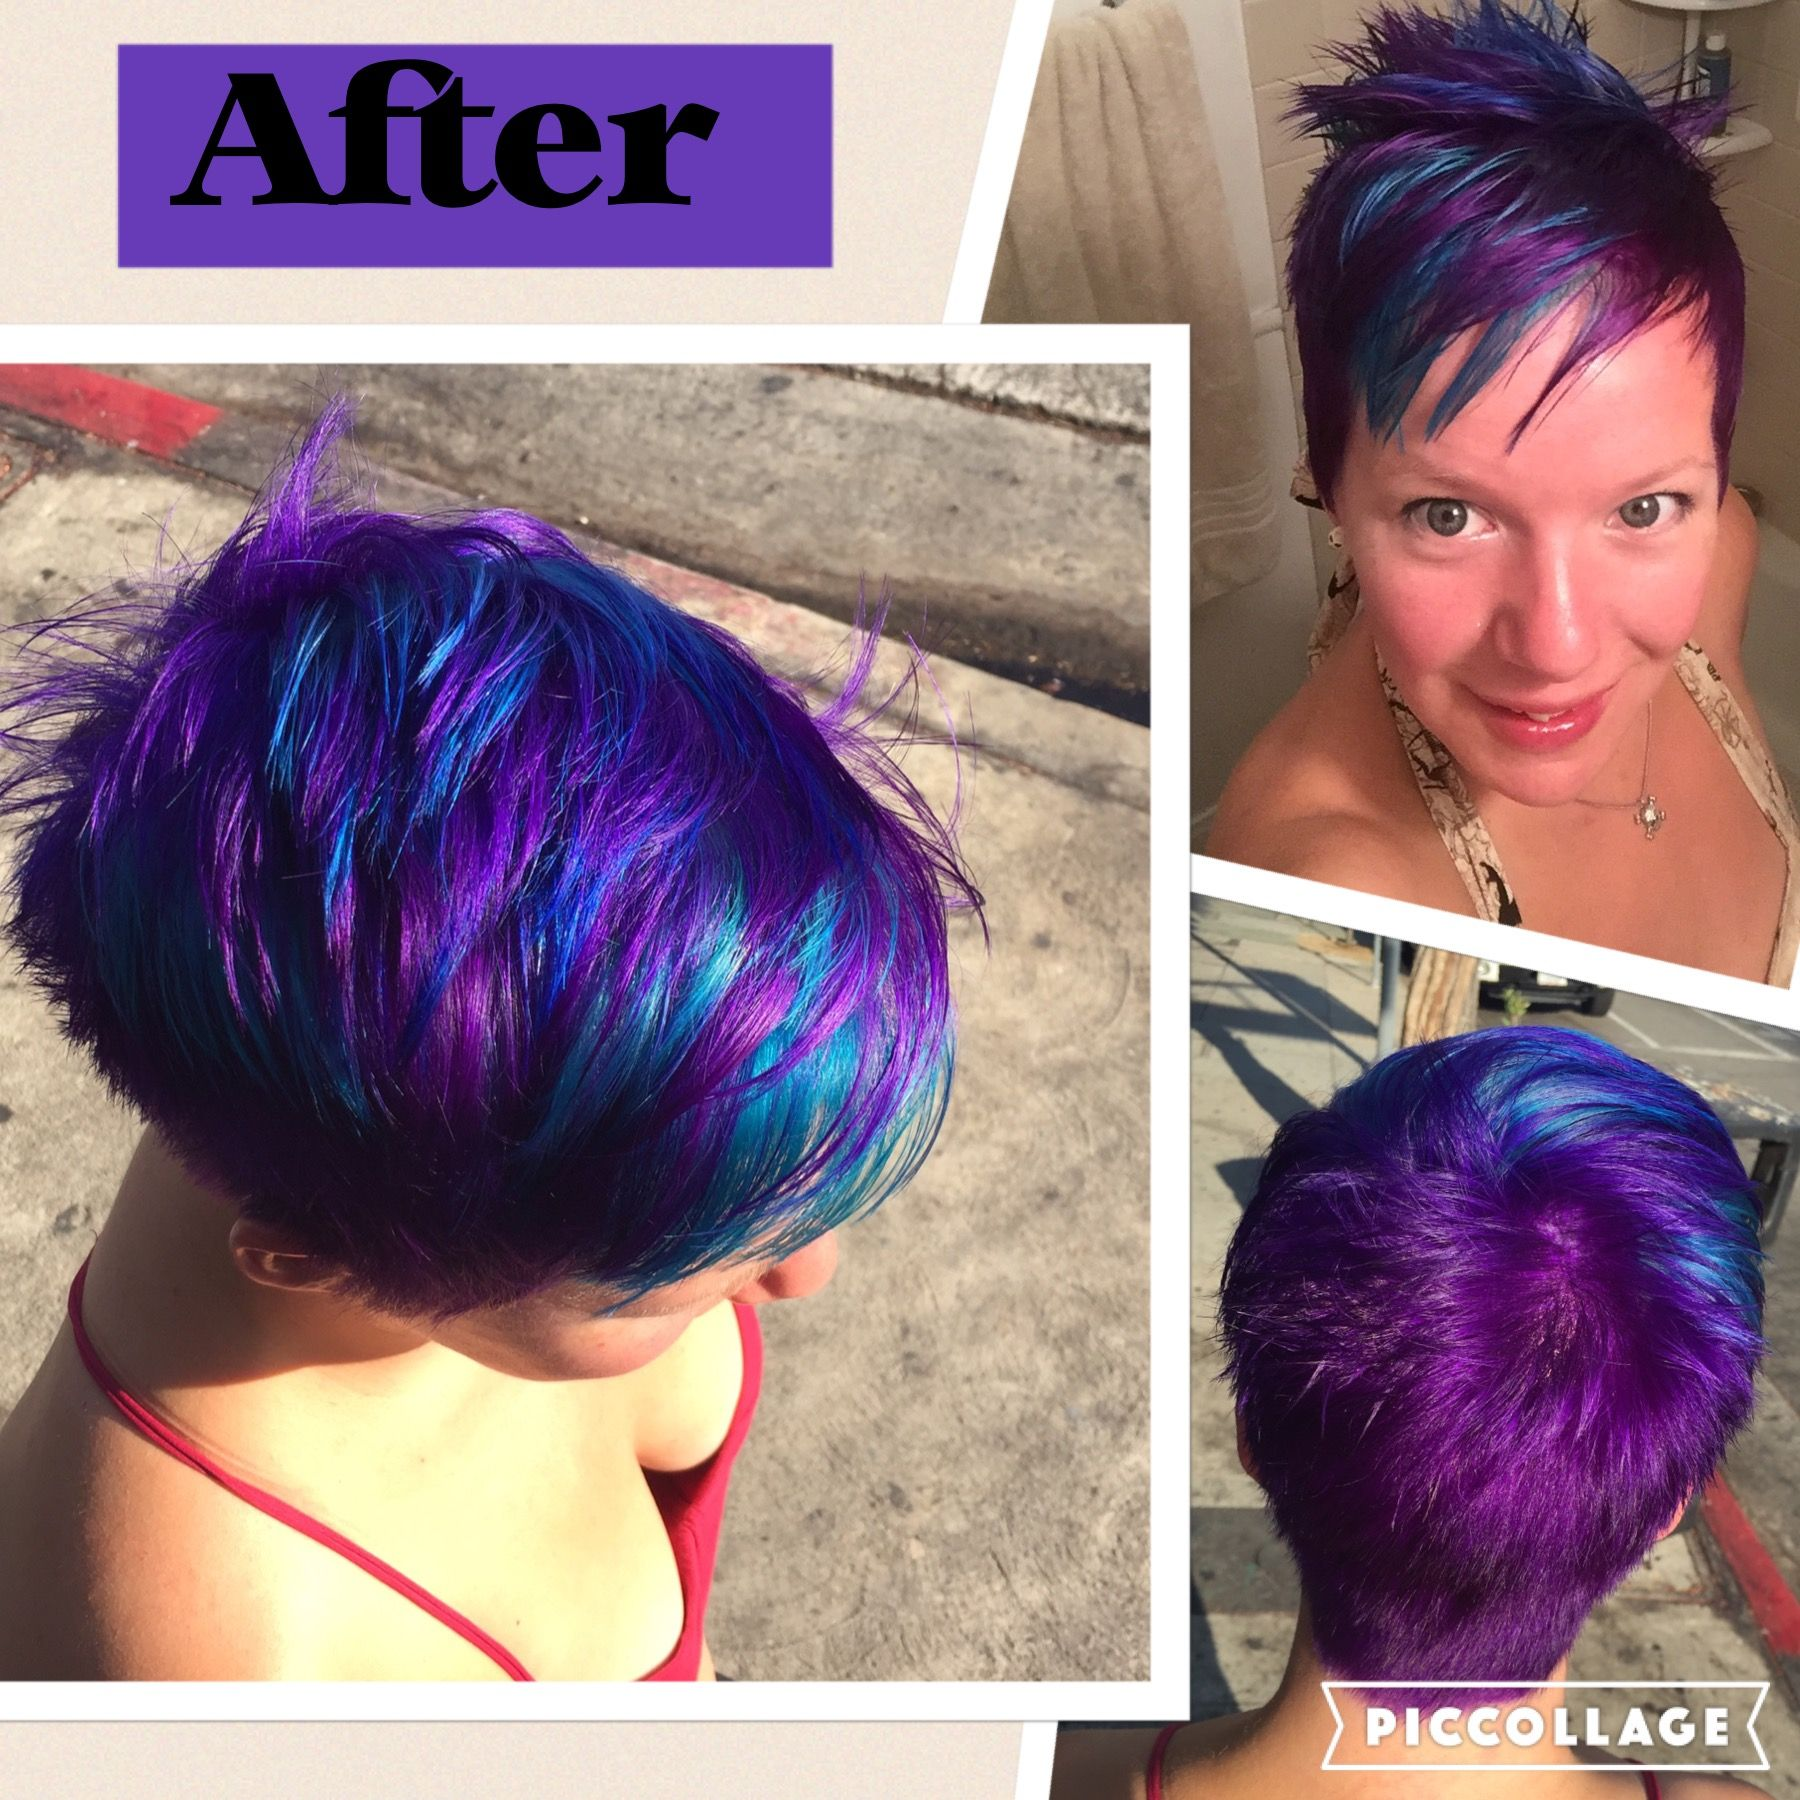 Mermaid rainbow hair purple blue teal Pixie short hair length